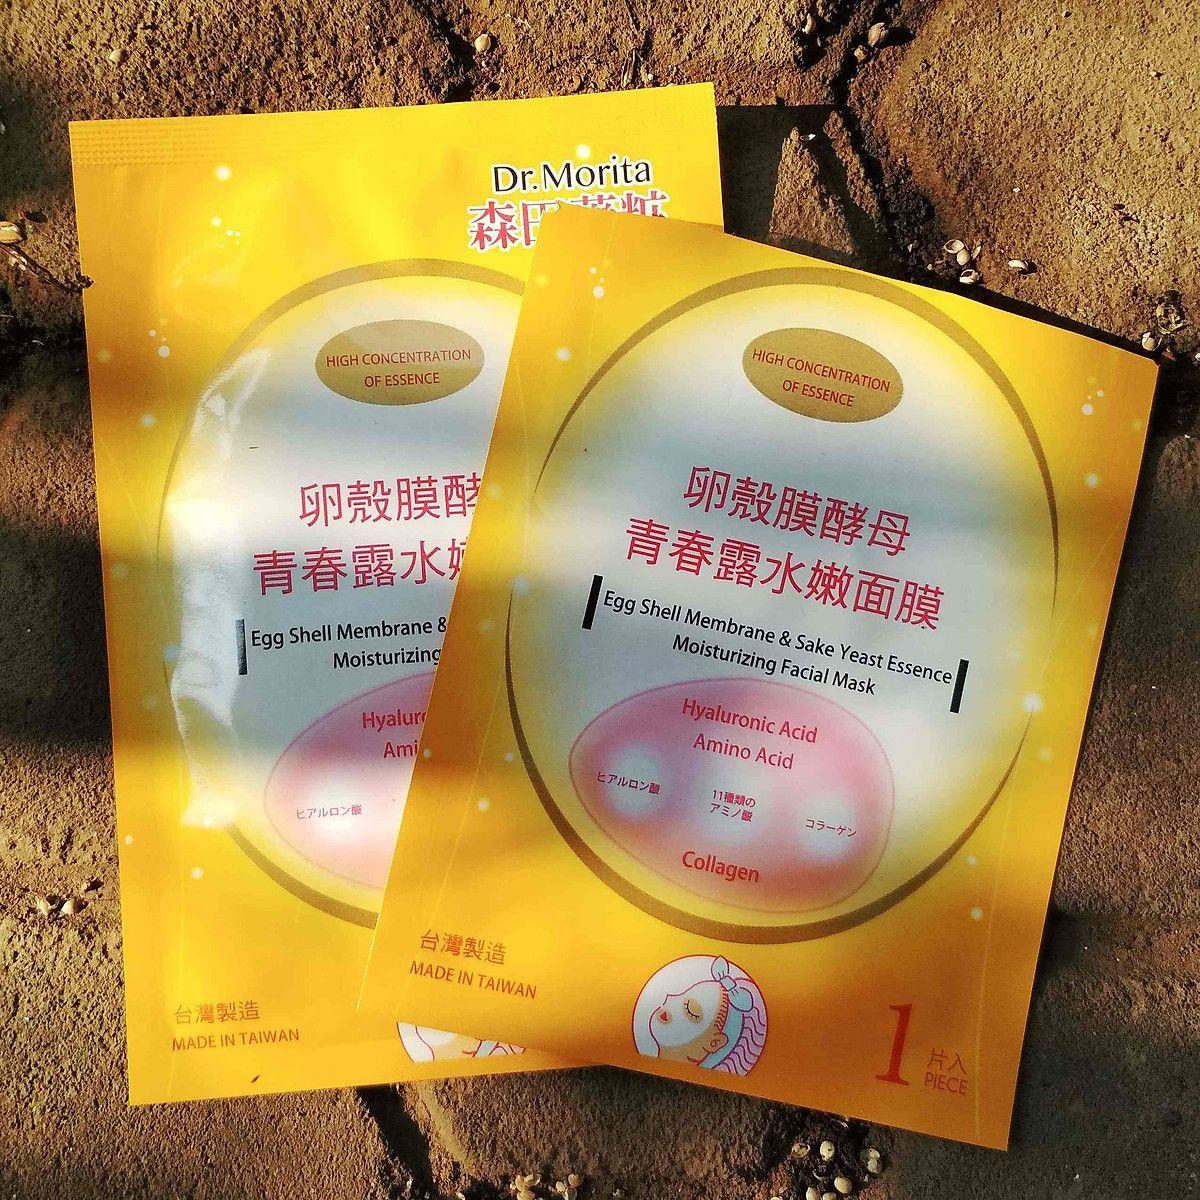 Review Egg Shell Membrane & Yeast Essence Moisturizing Facial Mask